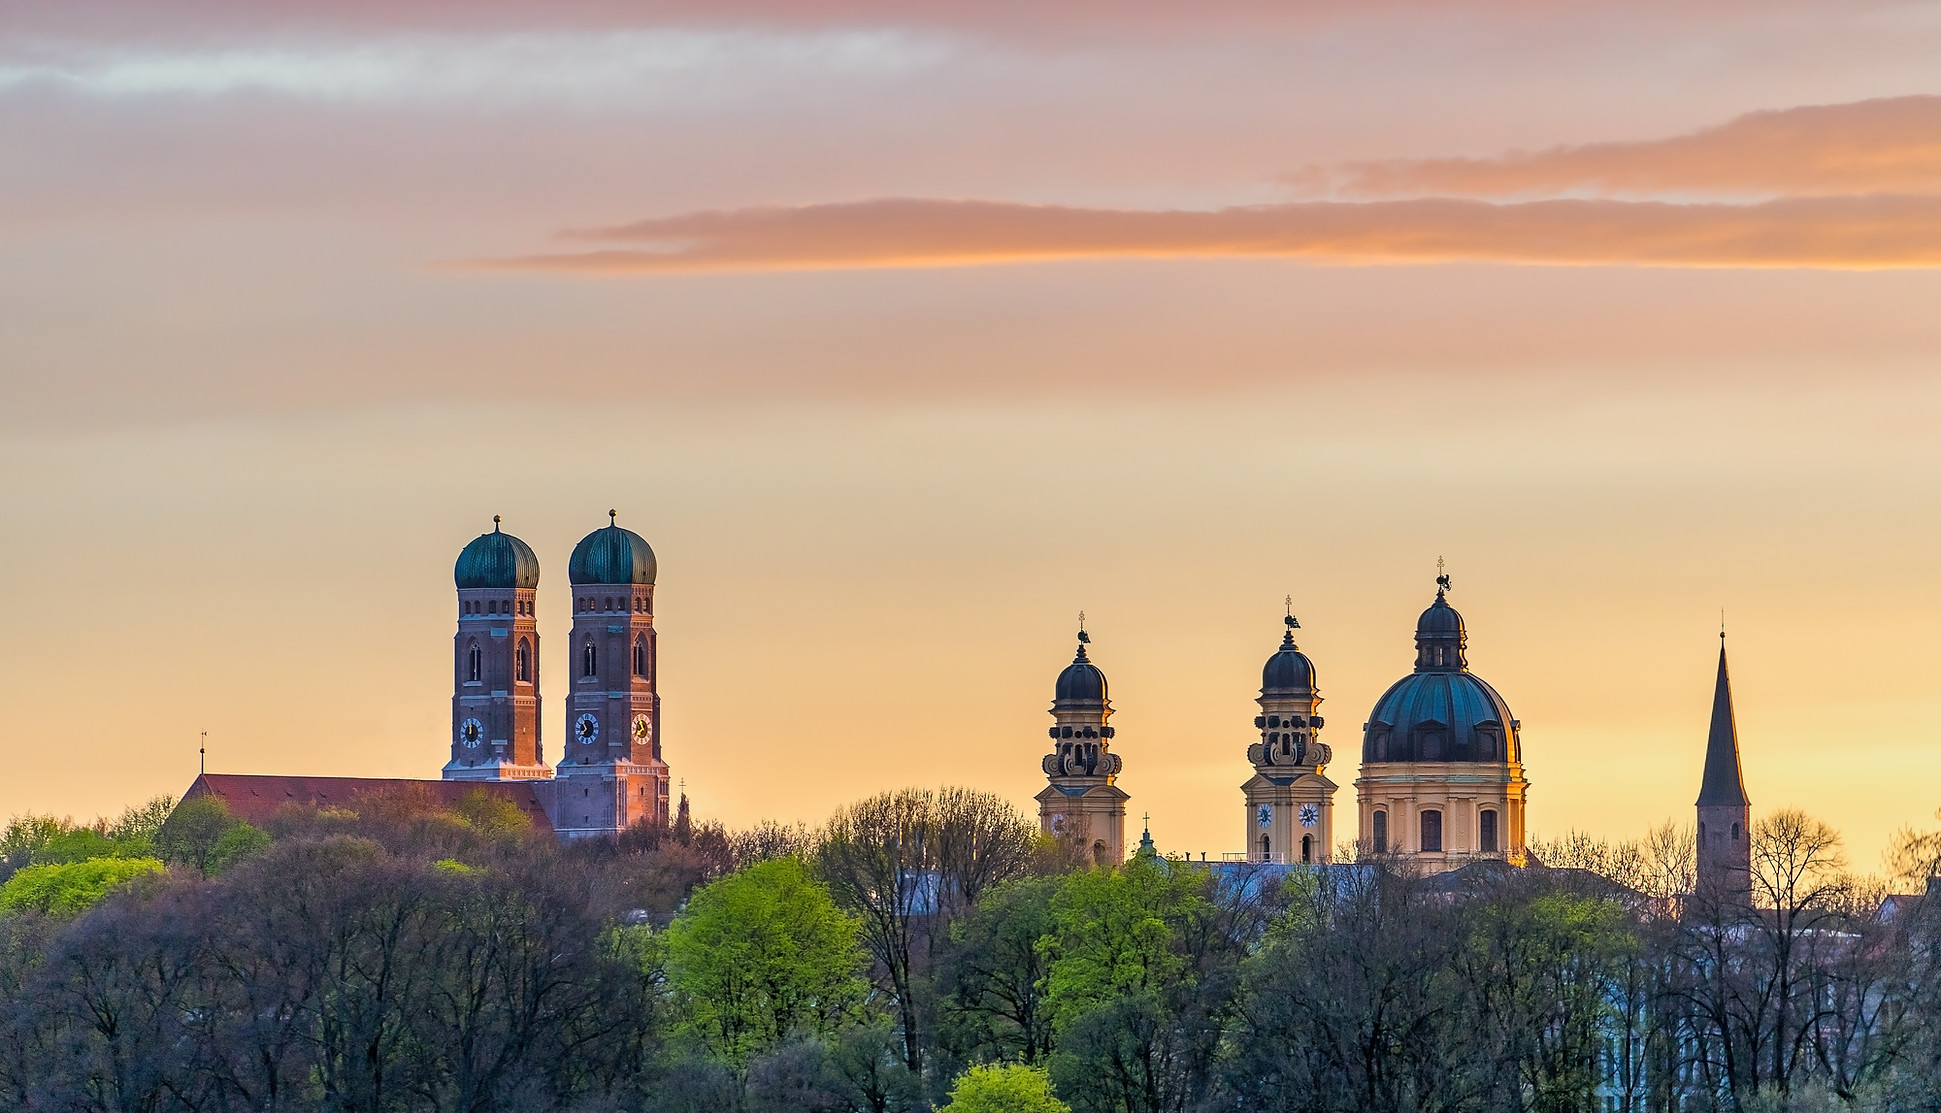 Munich Frauenkirche during beautiful sun